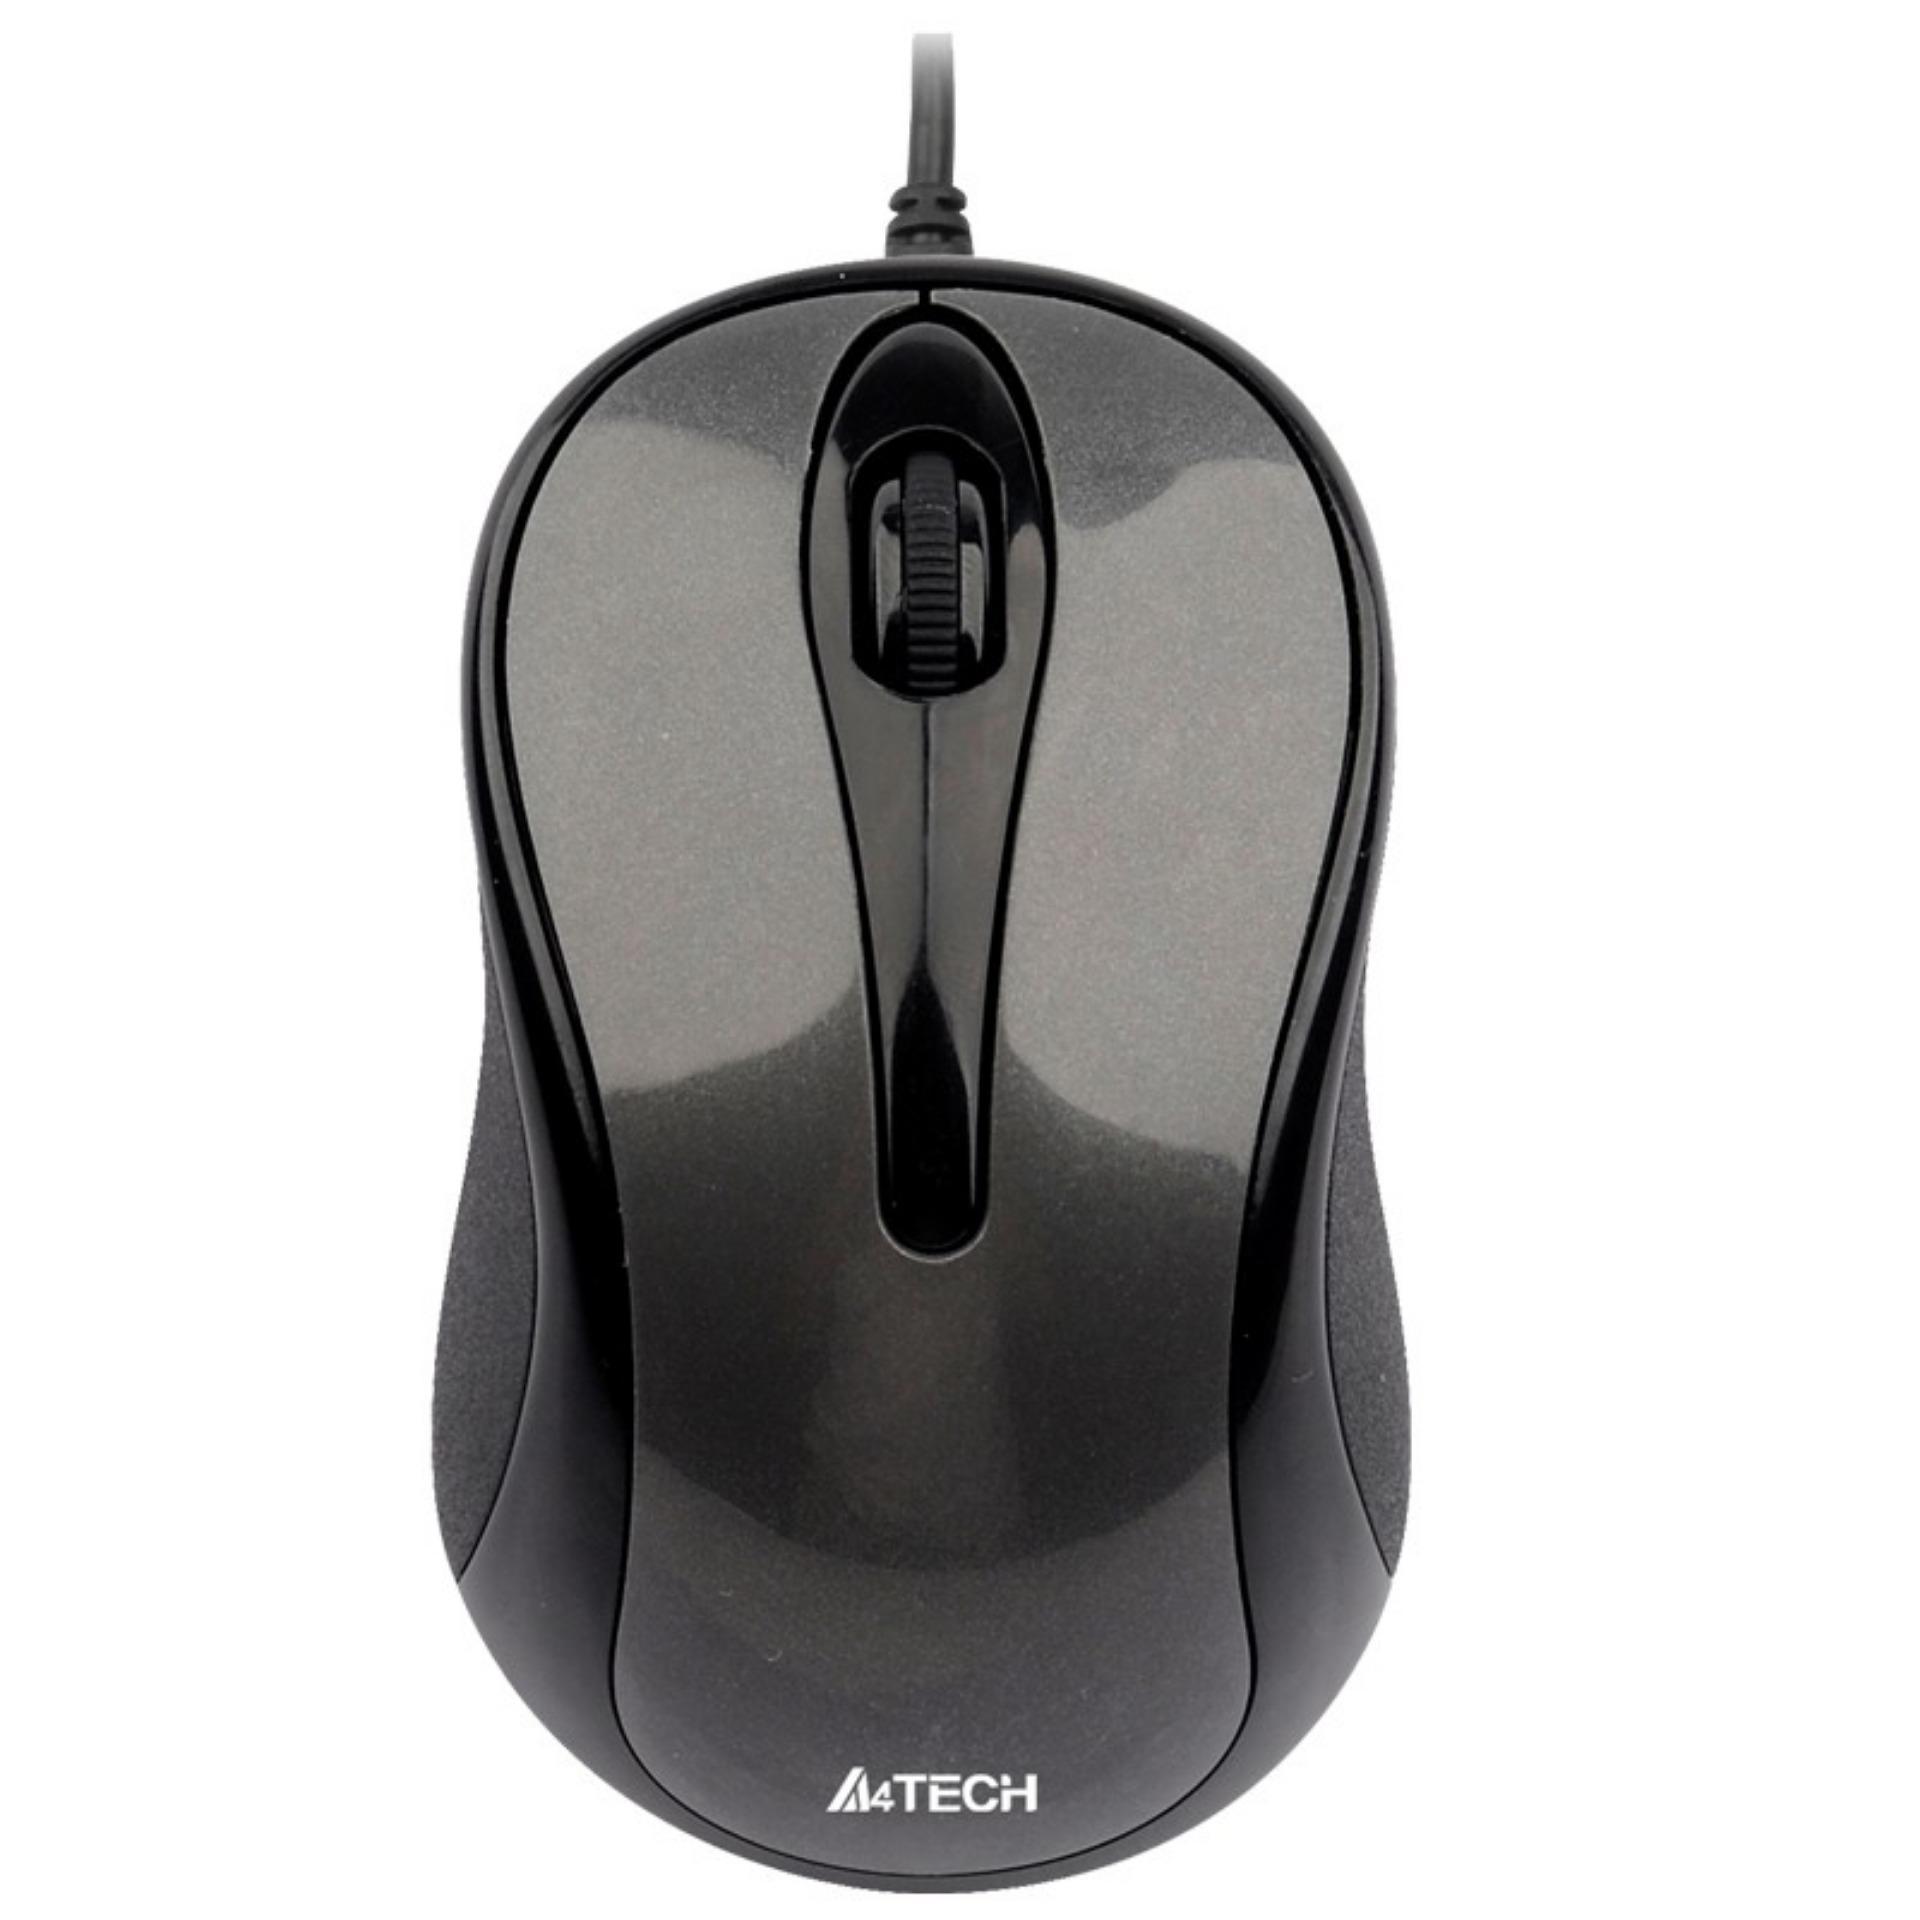 A4tech N-370FX Mouse Drivers PC